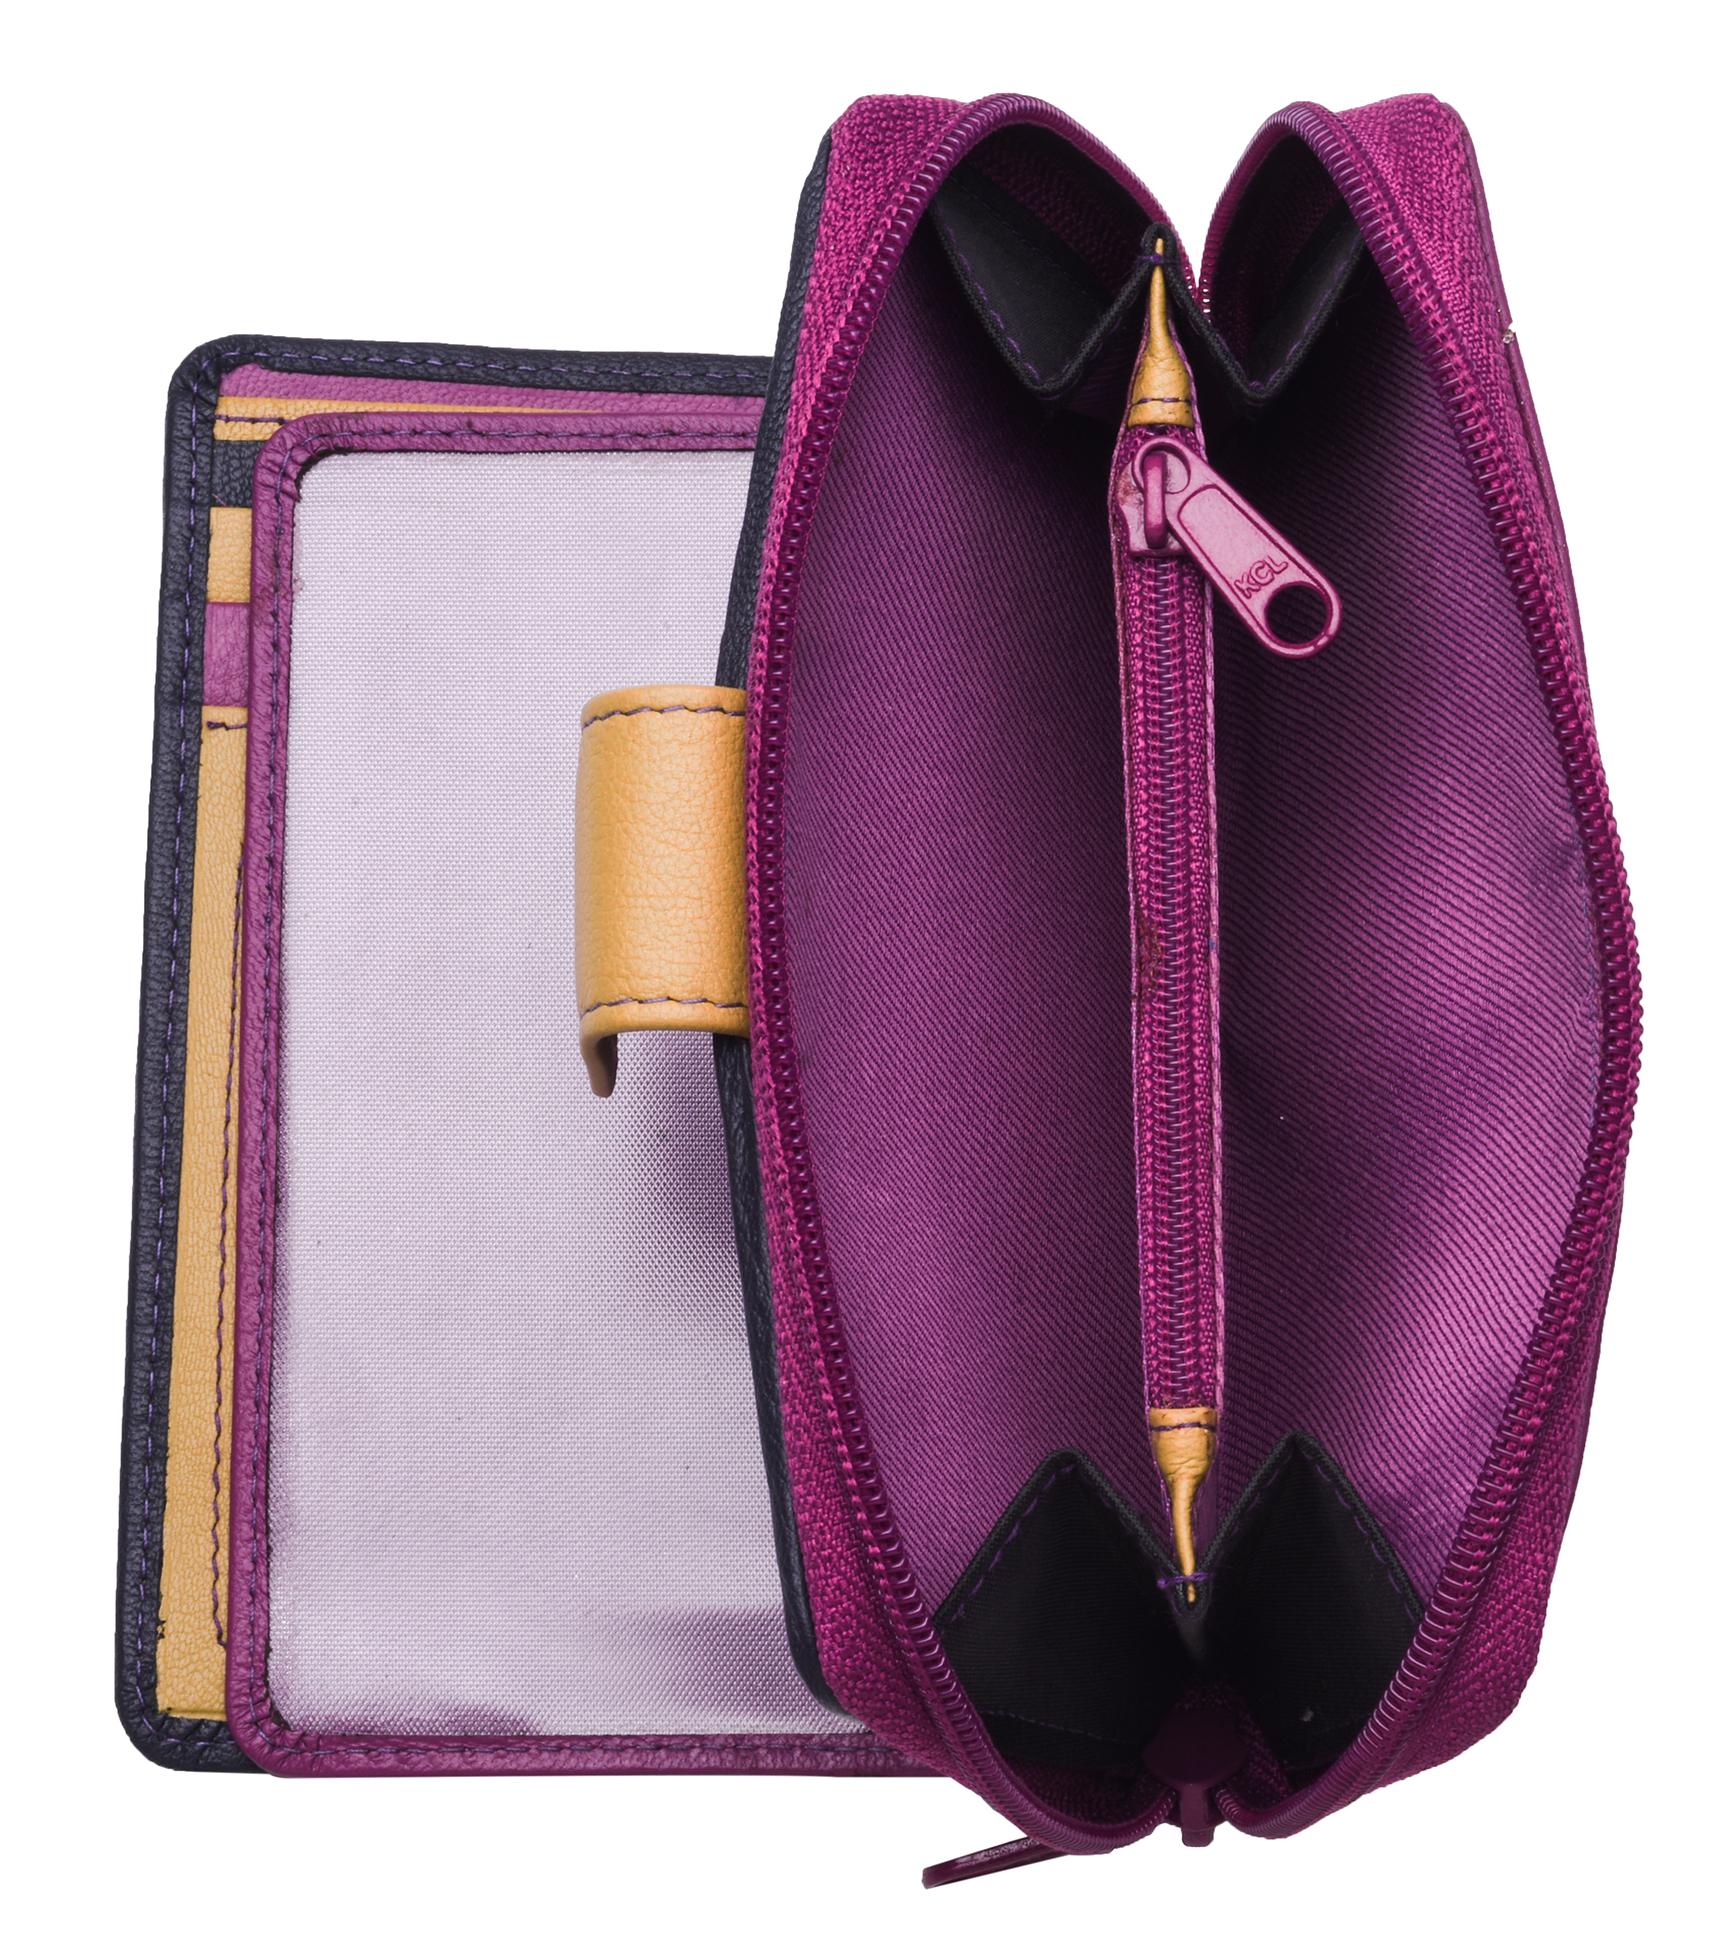 Ladies-Womens-RFID-Blocking-Safe-Leather-Bifold-Medium-Purse-Wallet-Coin-Section thumbnail 5